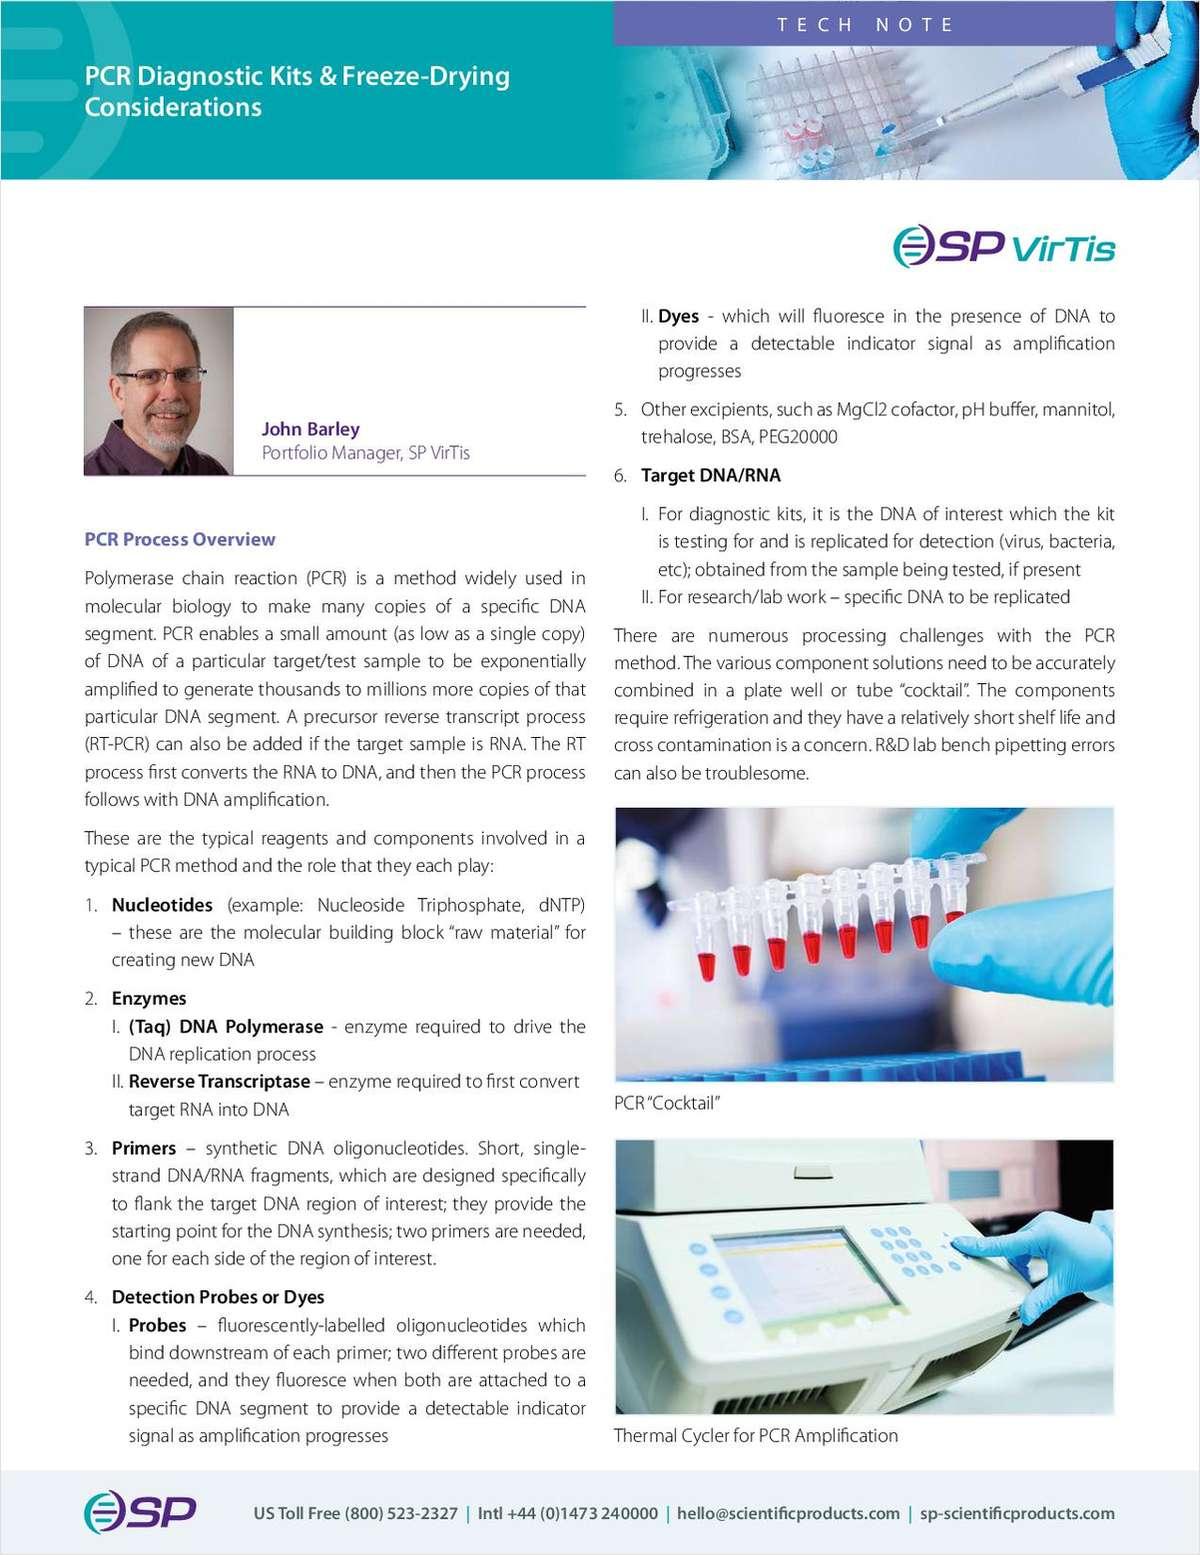 PCR Diagnostic Kits & Freeze-Drying Considerations